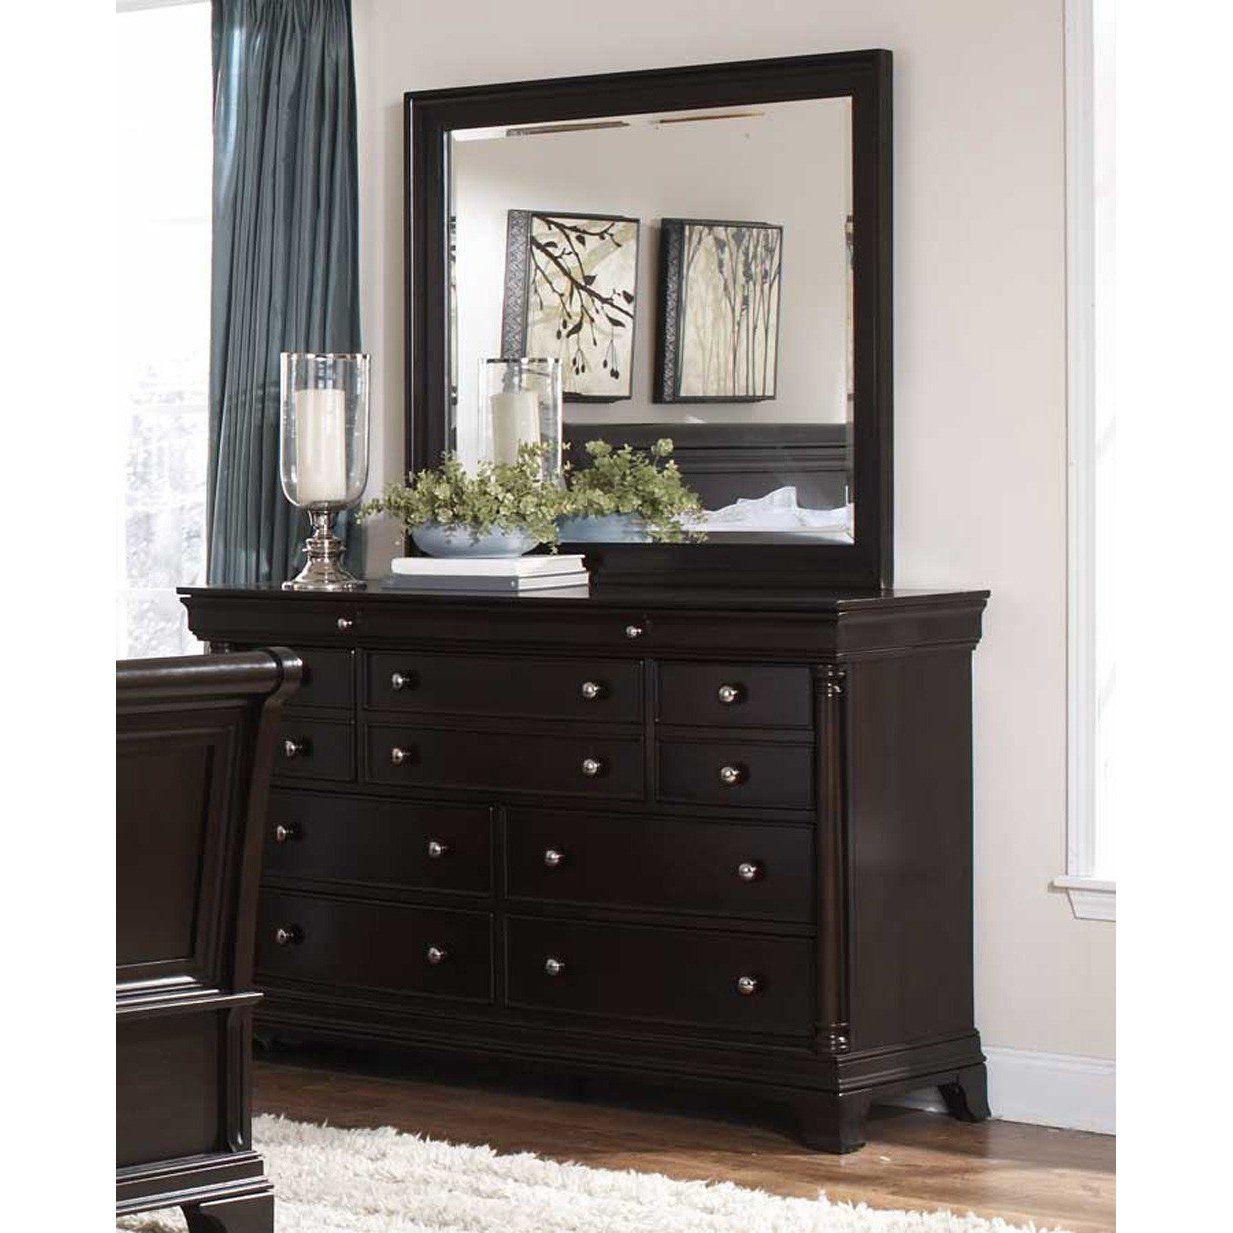 Inglewook Wood Dresser Rectangular Mirror Espresso Decoracion De Unas [ 1233 x 1233 Pixel ]